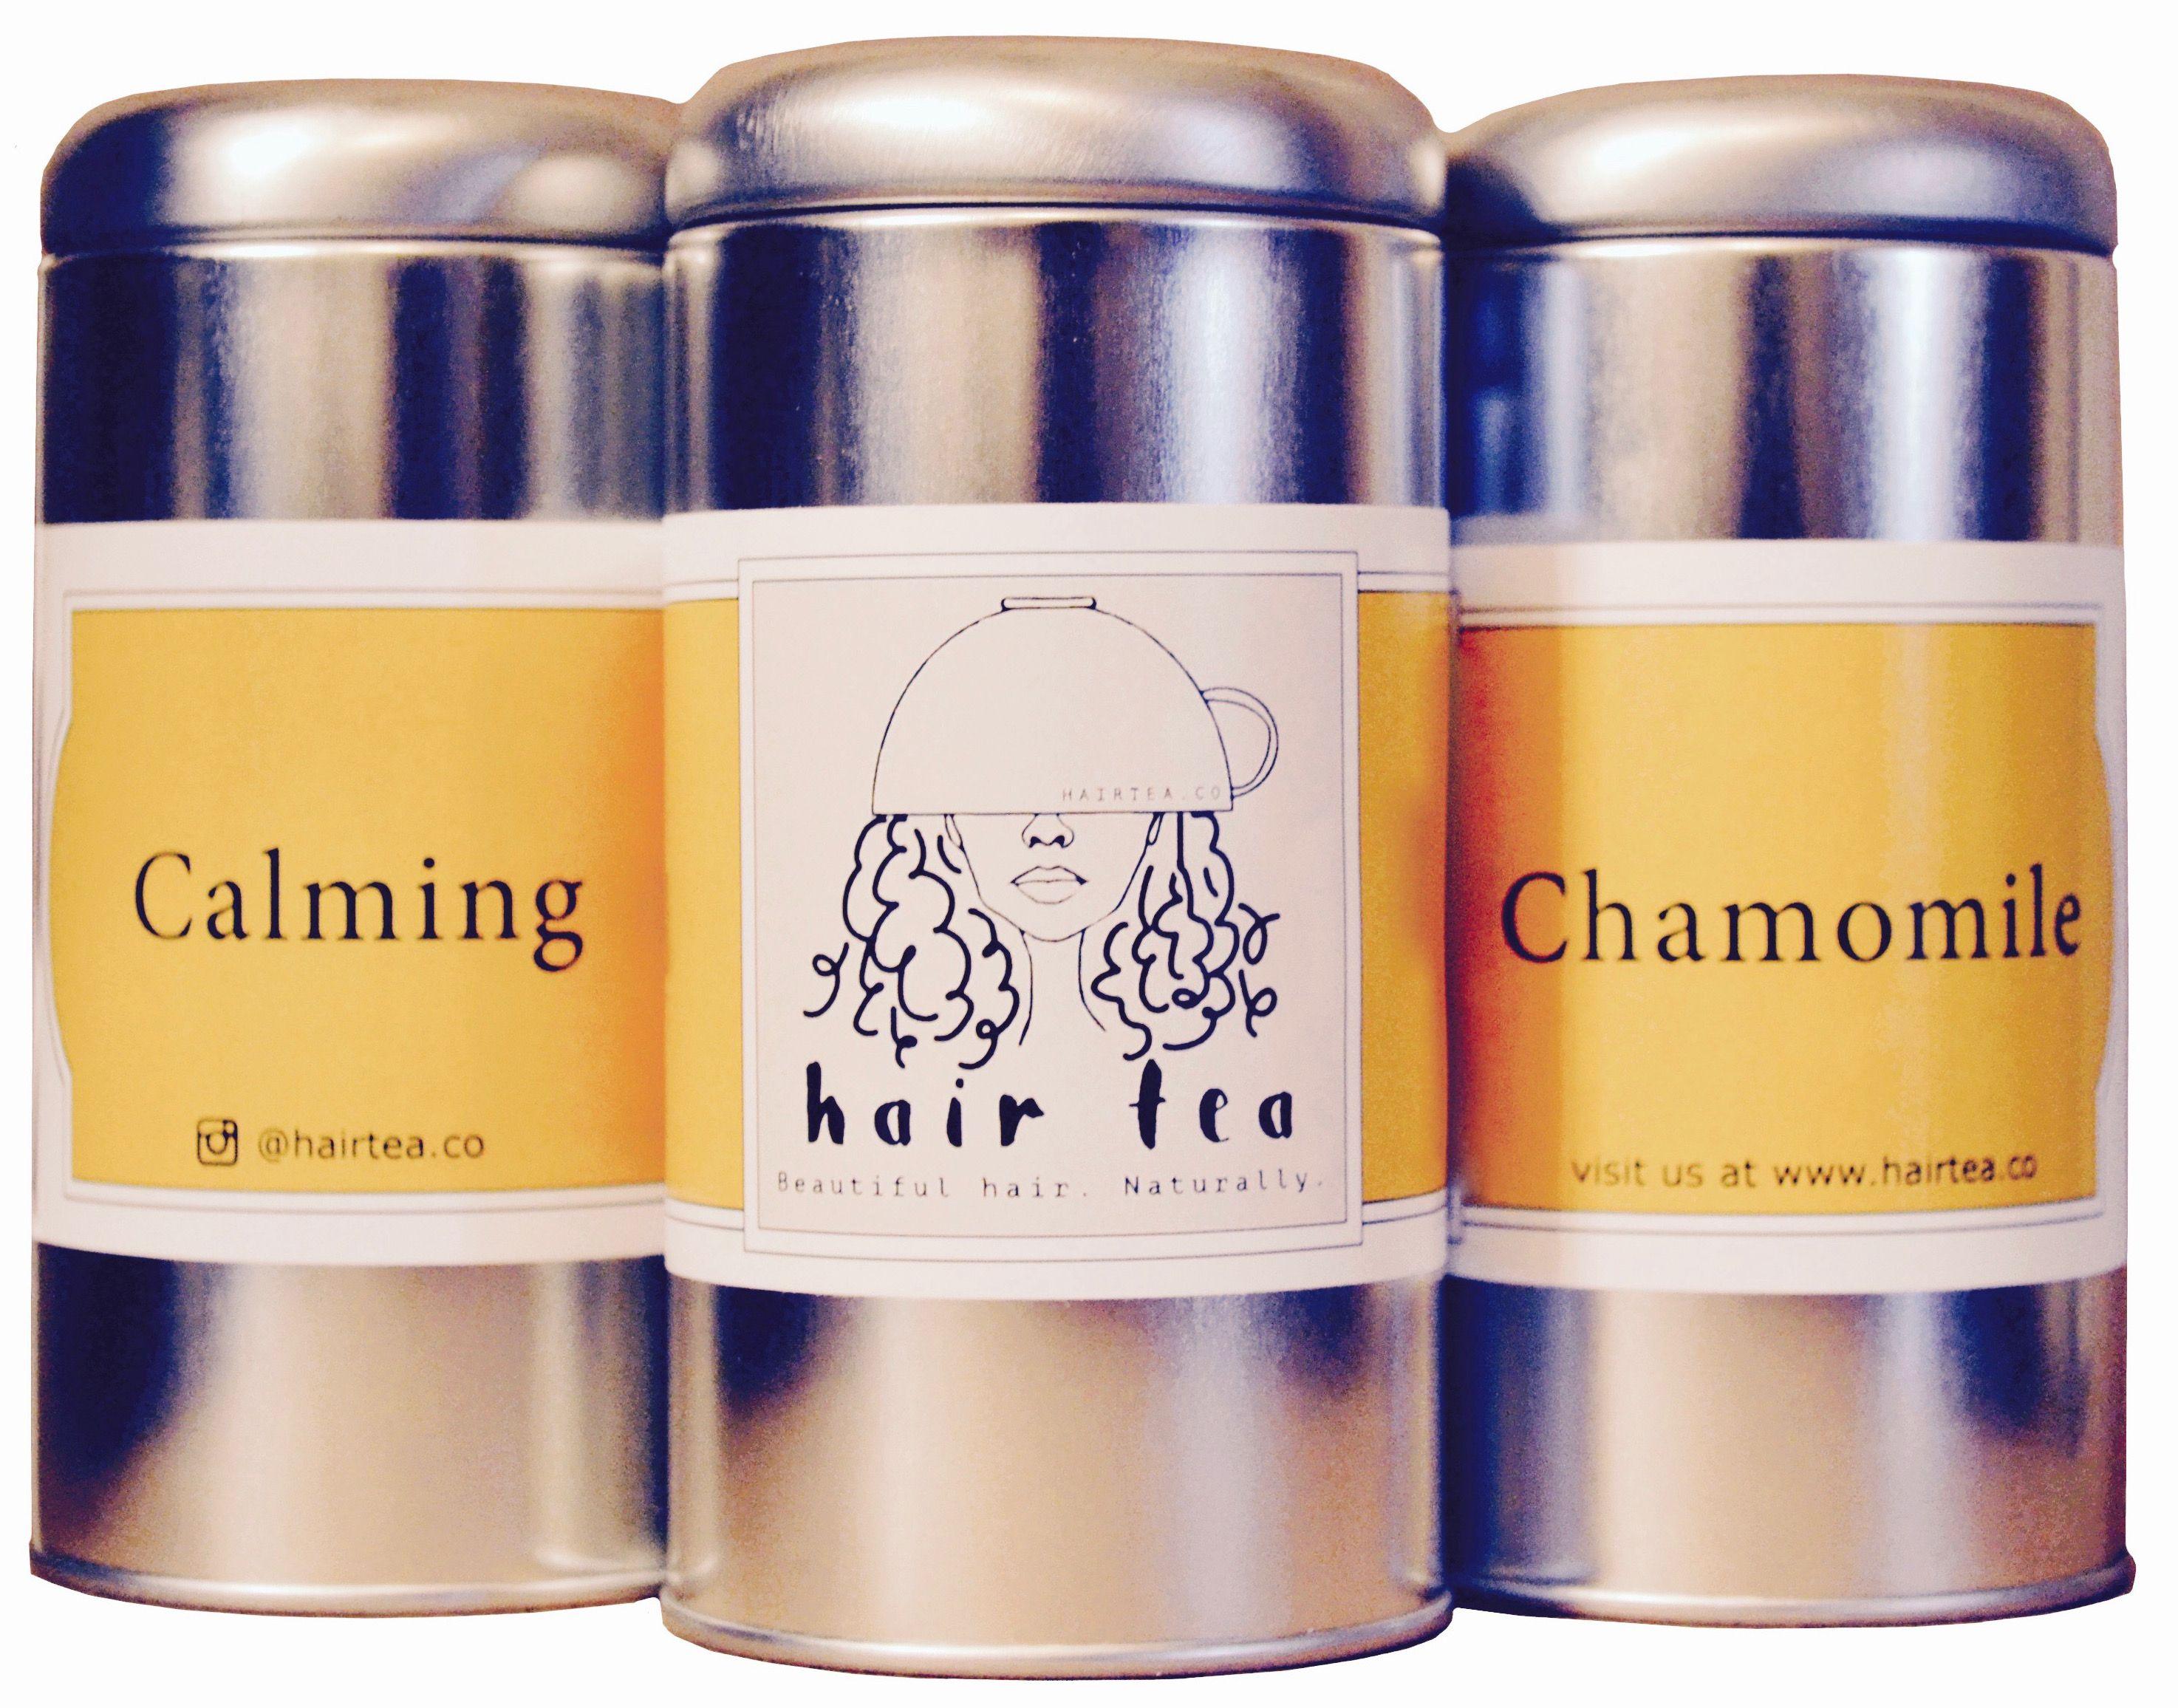 Calming Chamomile. The perfect hairtea for hair that